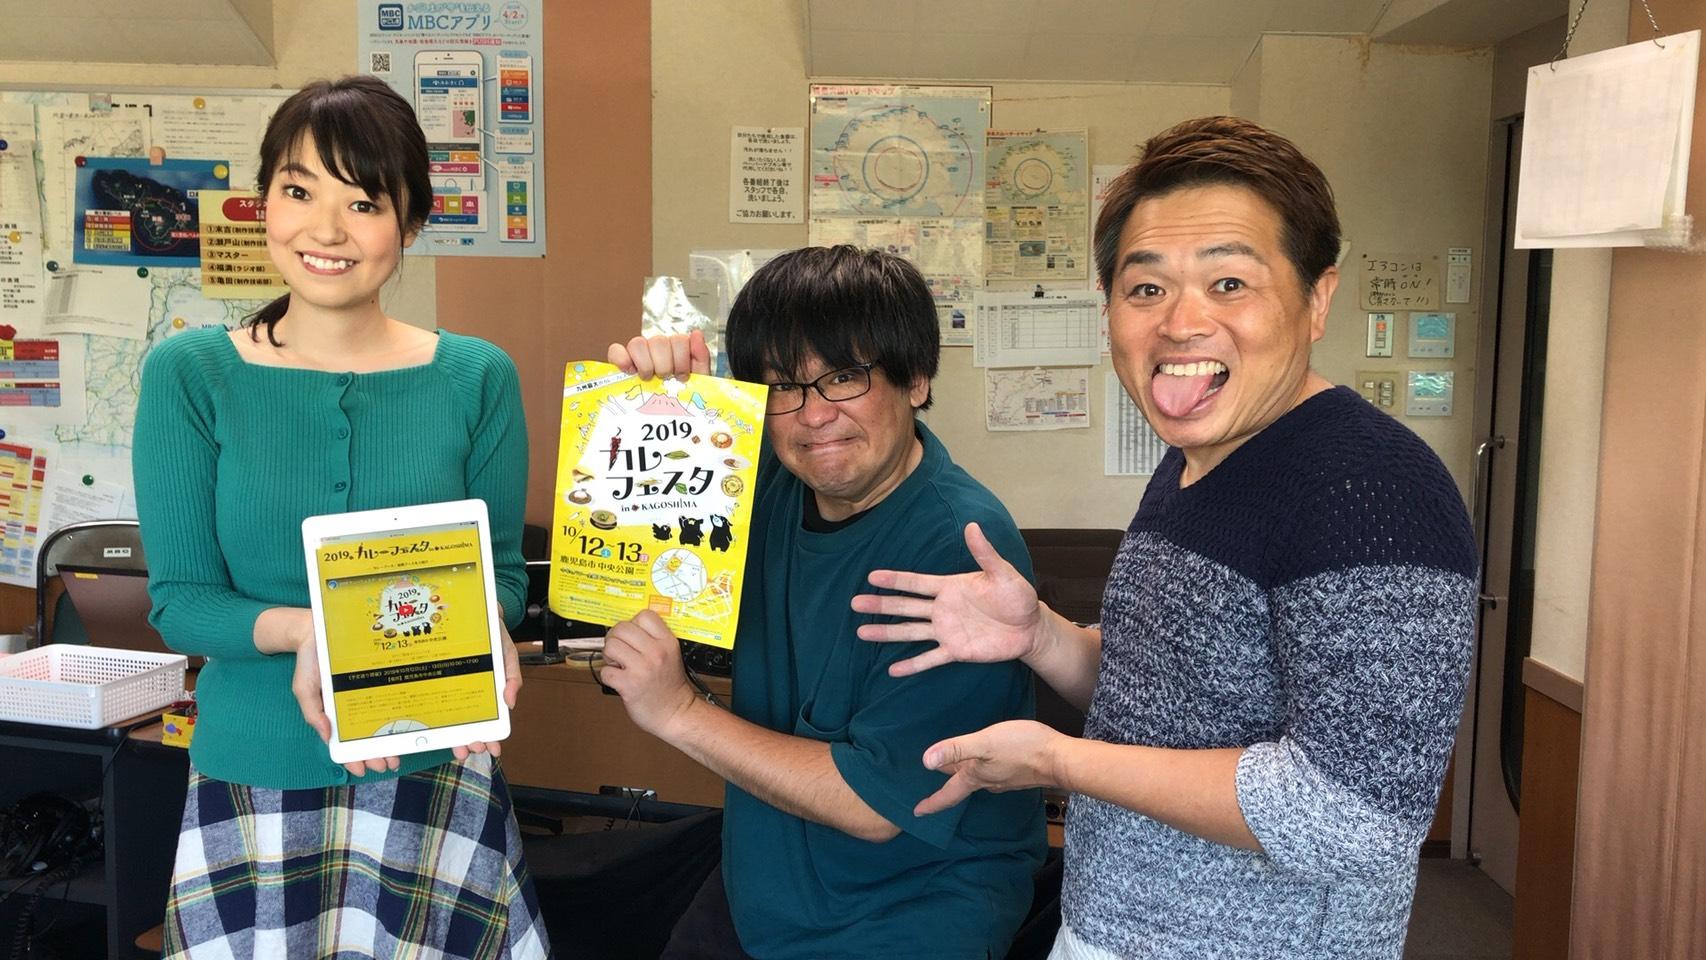 【MBCバズかご】カレーフェスタinKagoshima開催記念!最近食べたおすすめカレーの話【2019.10.12】